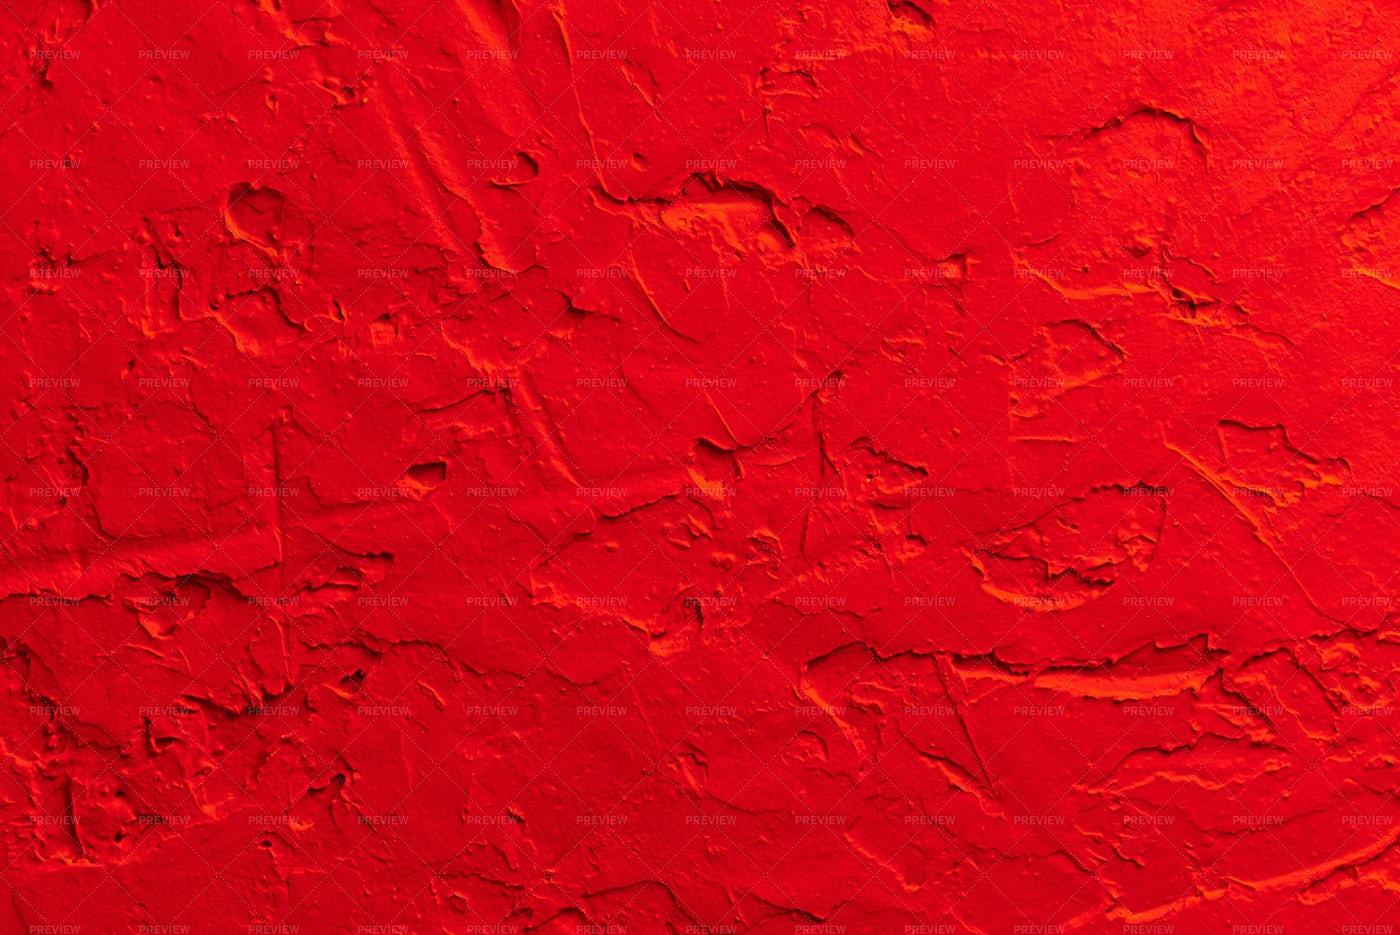 Red Concrete Wall: Stock Photos